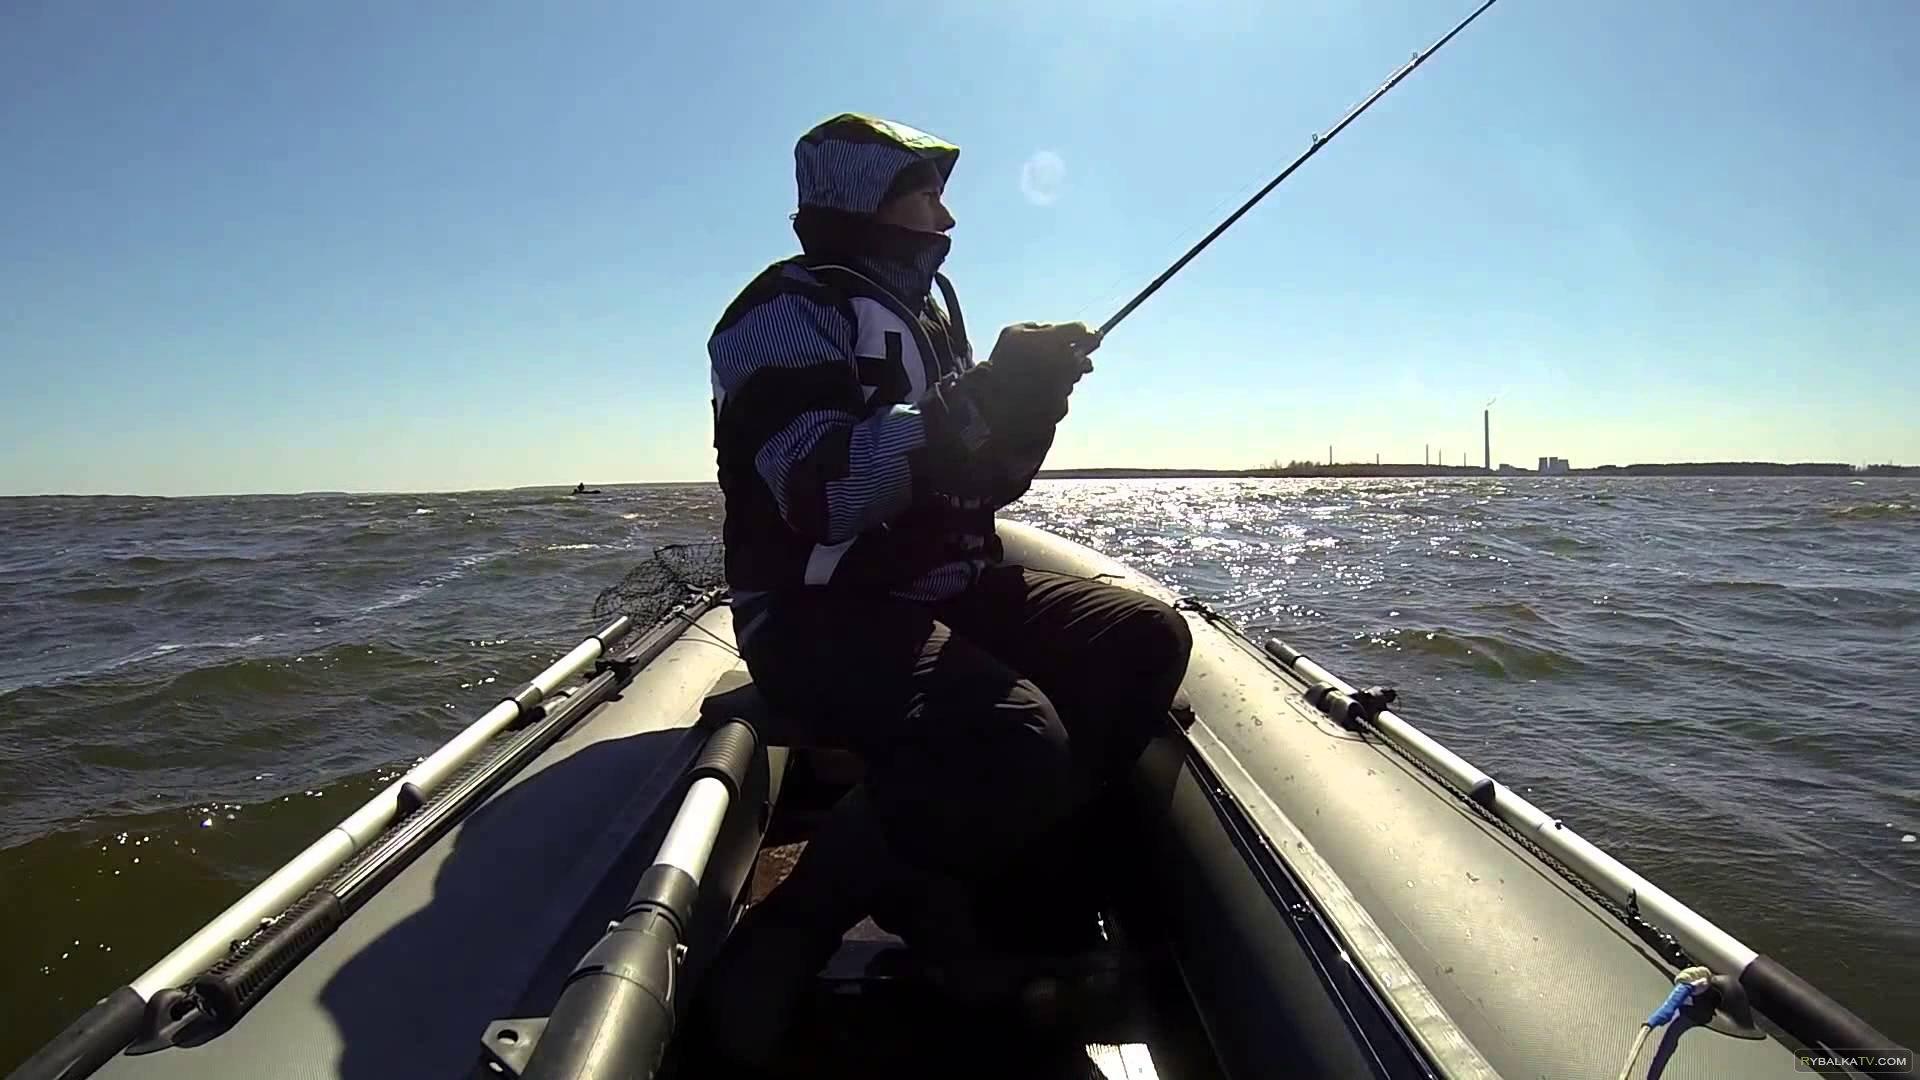 ACTIVE FISHING А.Шилин. Осенняя рыбалка на реке Дон